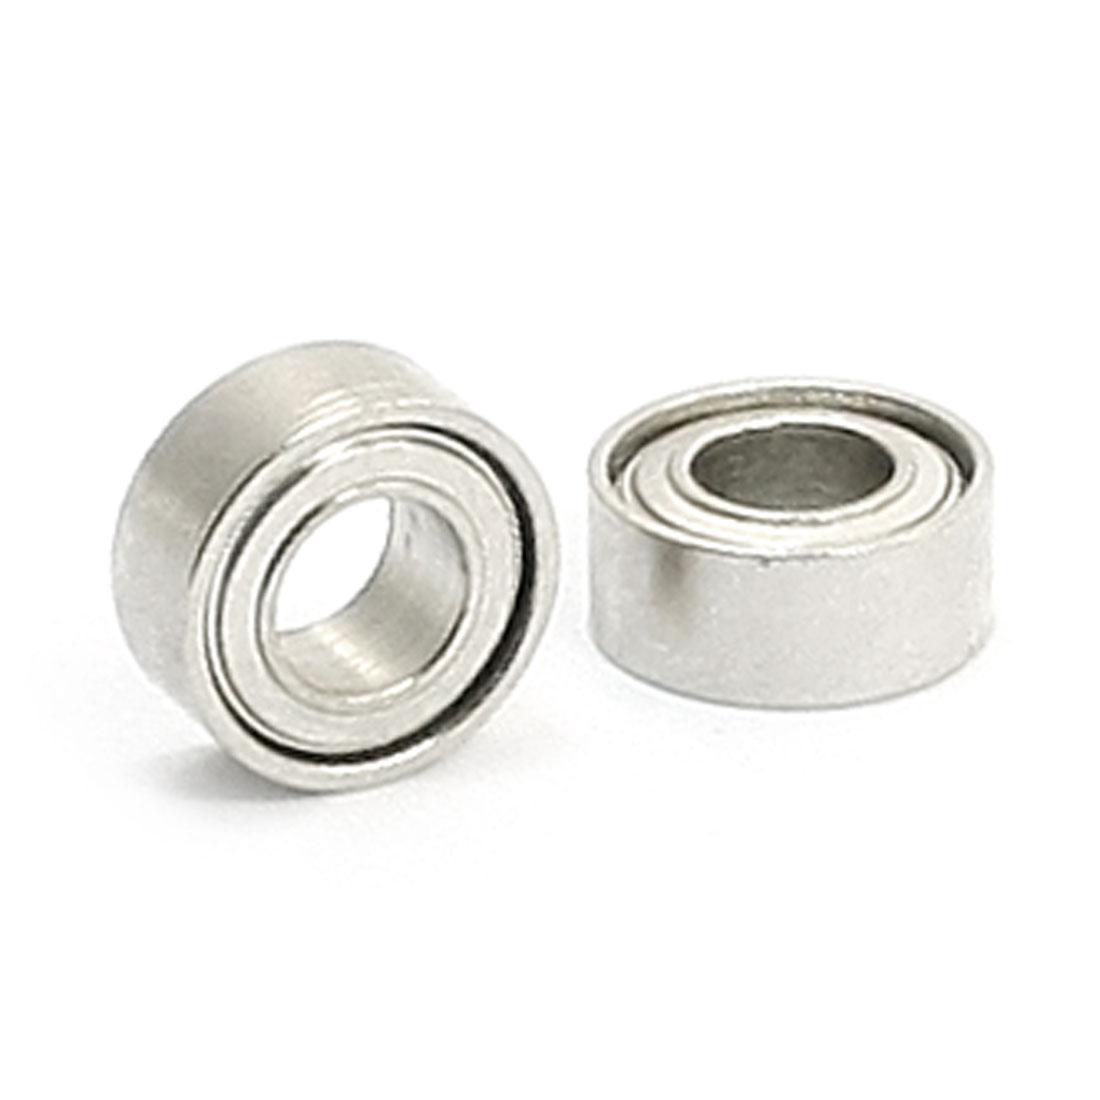 Single Row Shielded Deep Groove Ball Bearings 3mm x 6mm x 2.5mm 2pcs